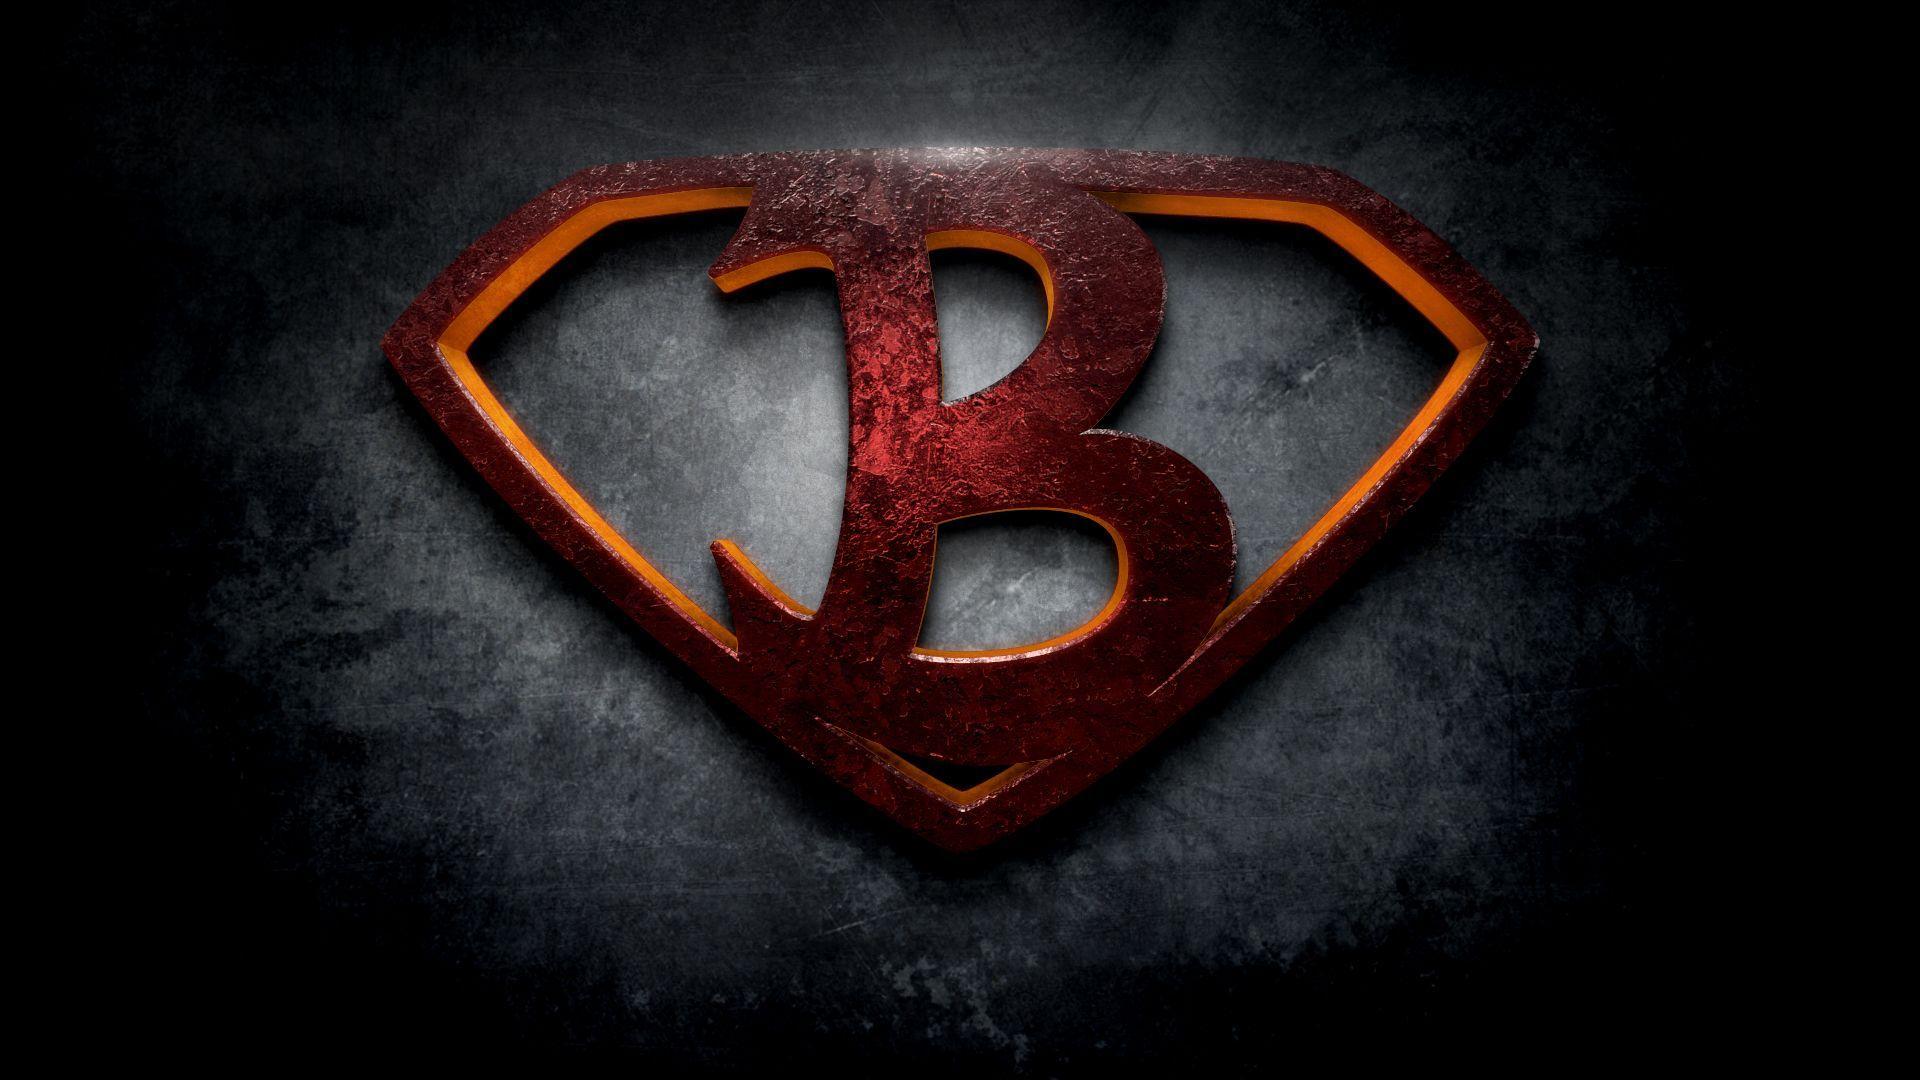 B Logo Wallpapers HD - Wallpaper Cave